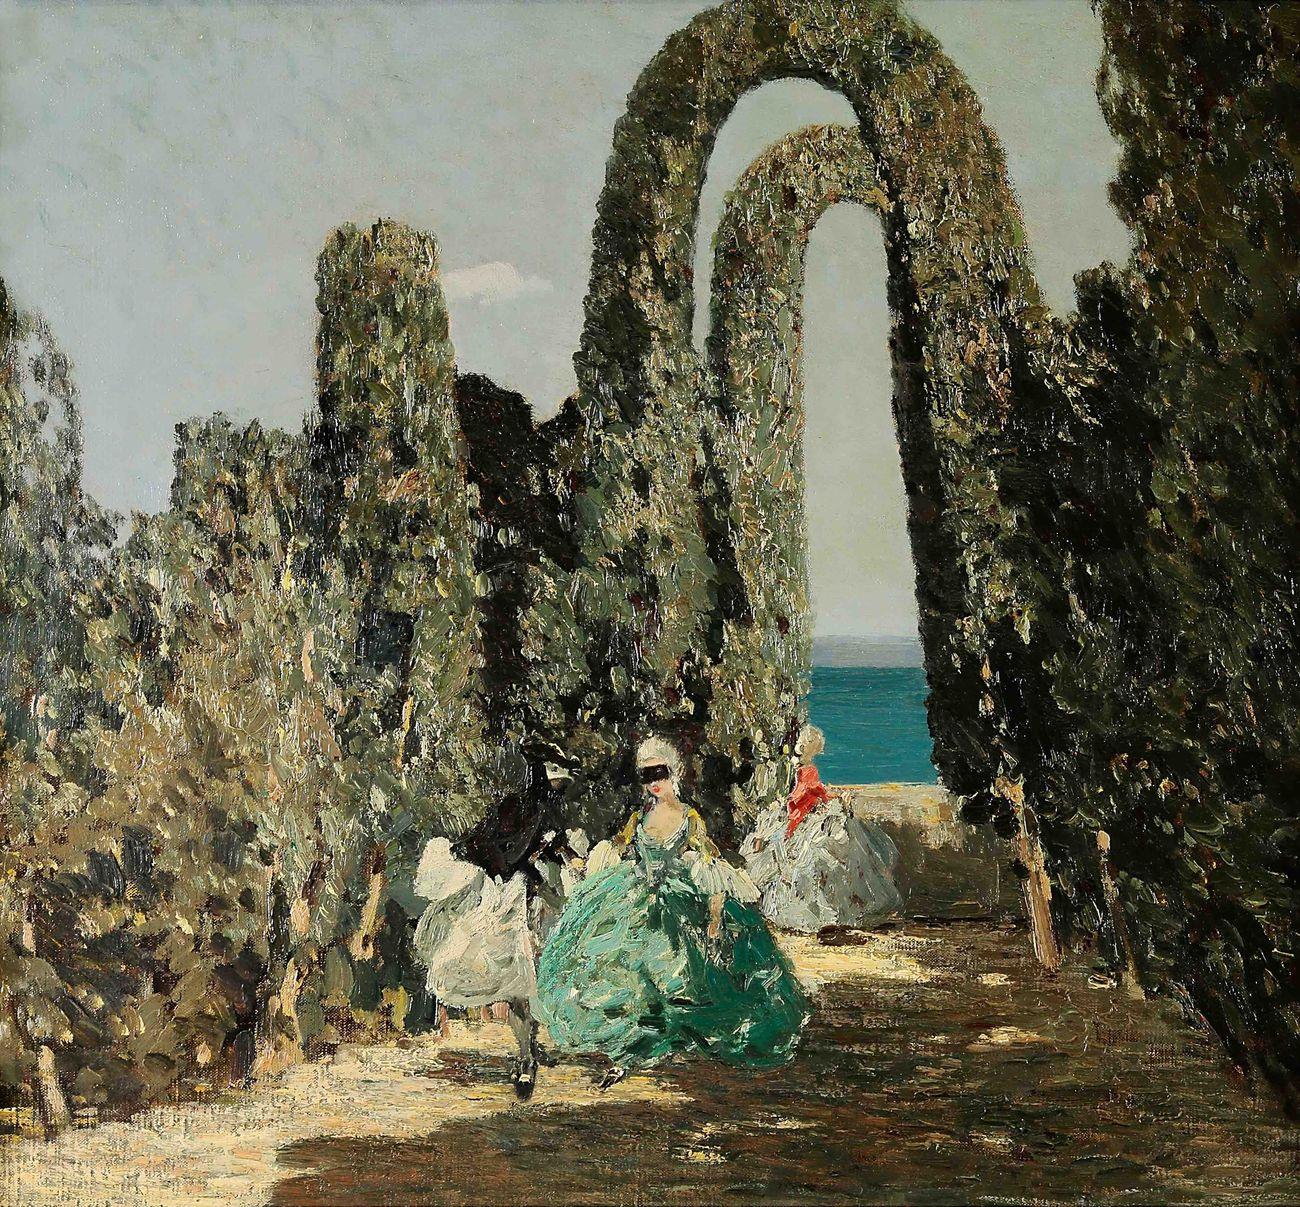 save off 54697 7036c Emma Ciardi, Dame mascherate, 1909 ca. Courtesy Galleria ...